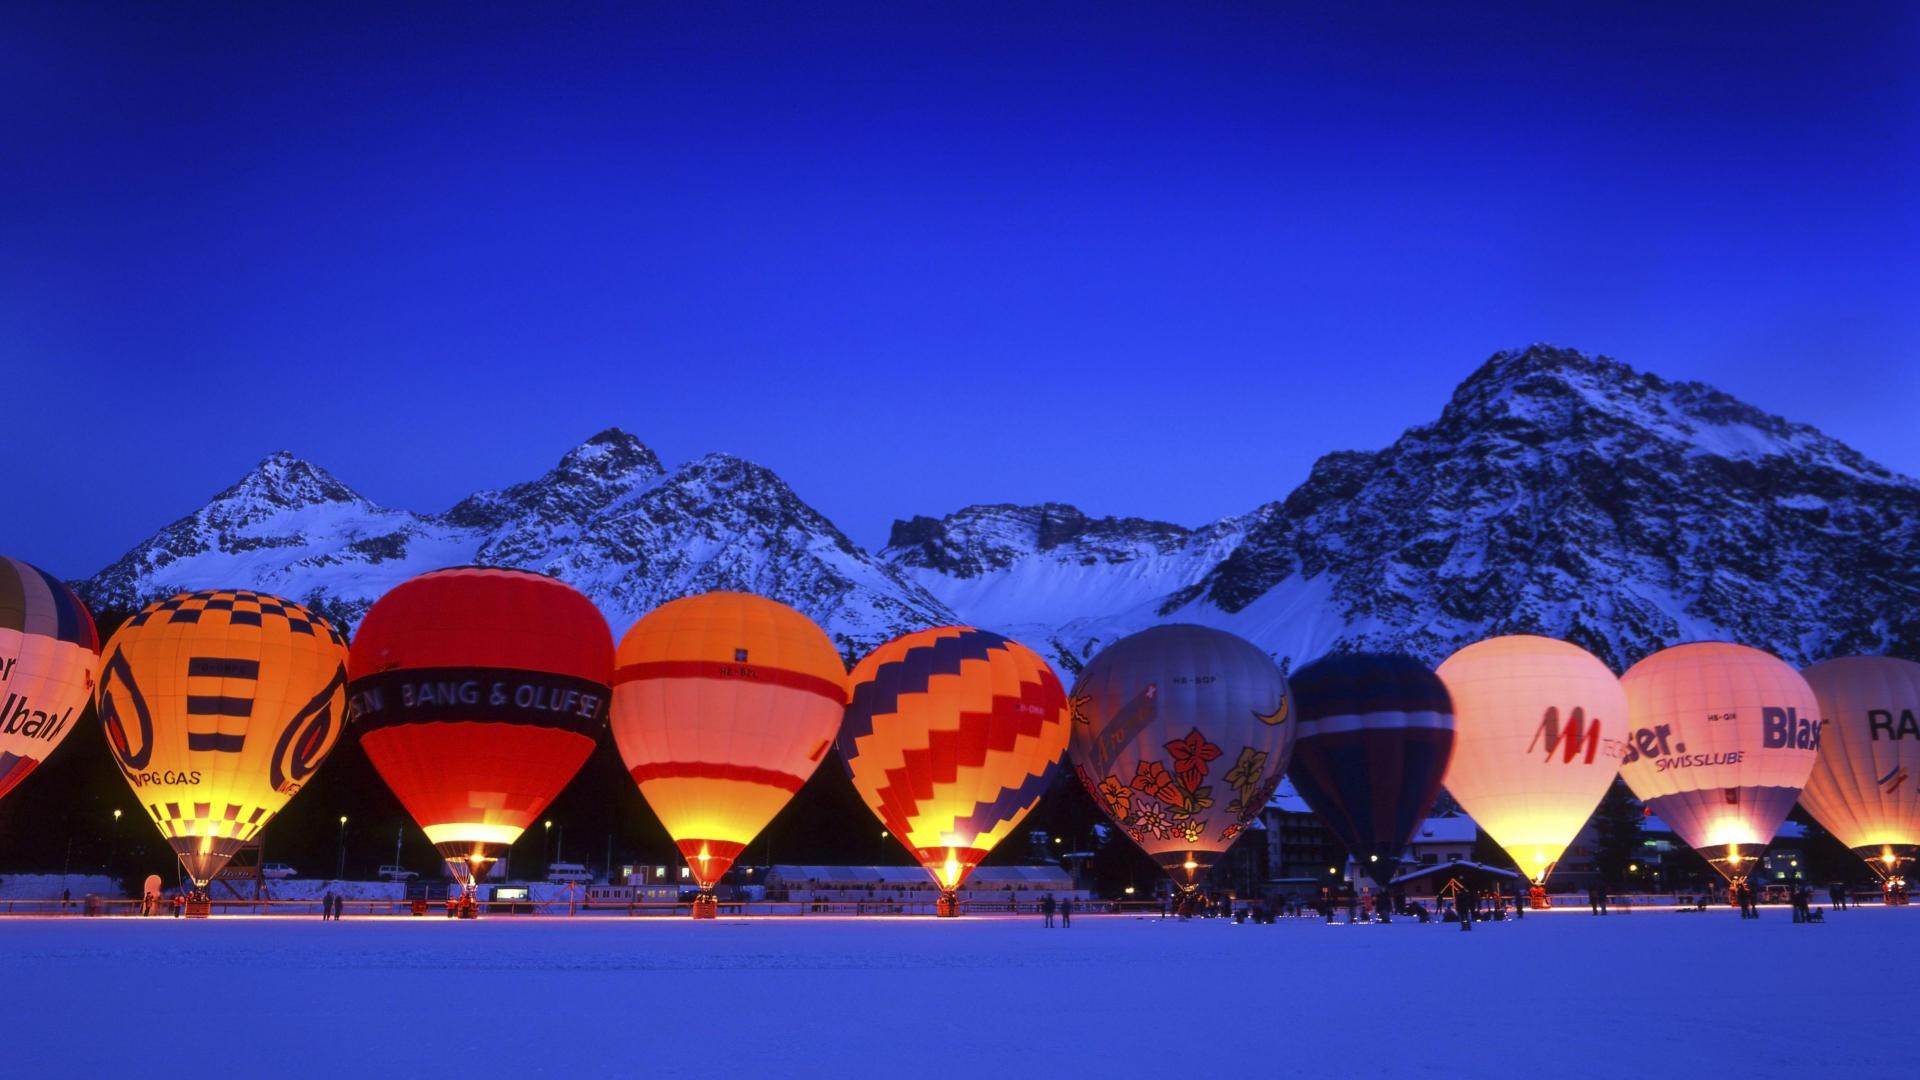 Balloon desktop wallpaper wallpapersafari - Air wallpaper hd ...